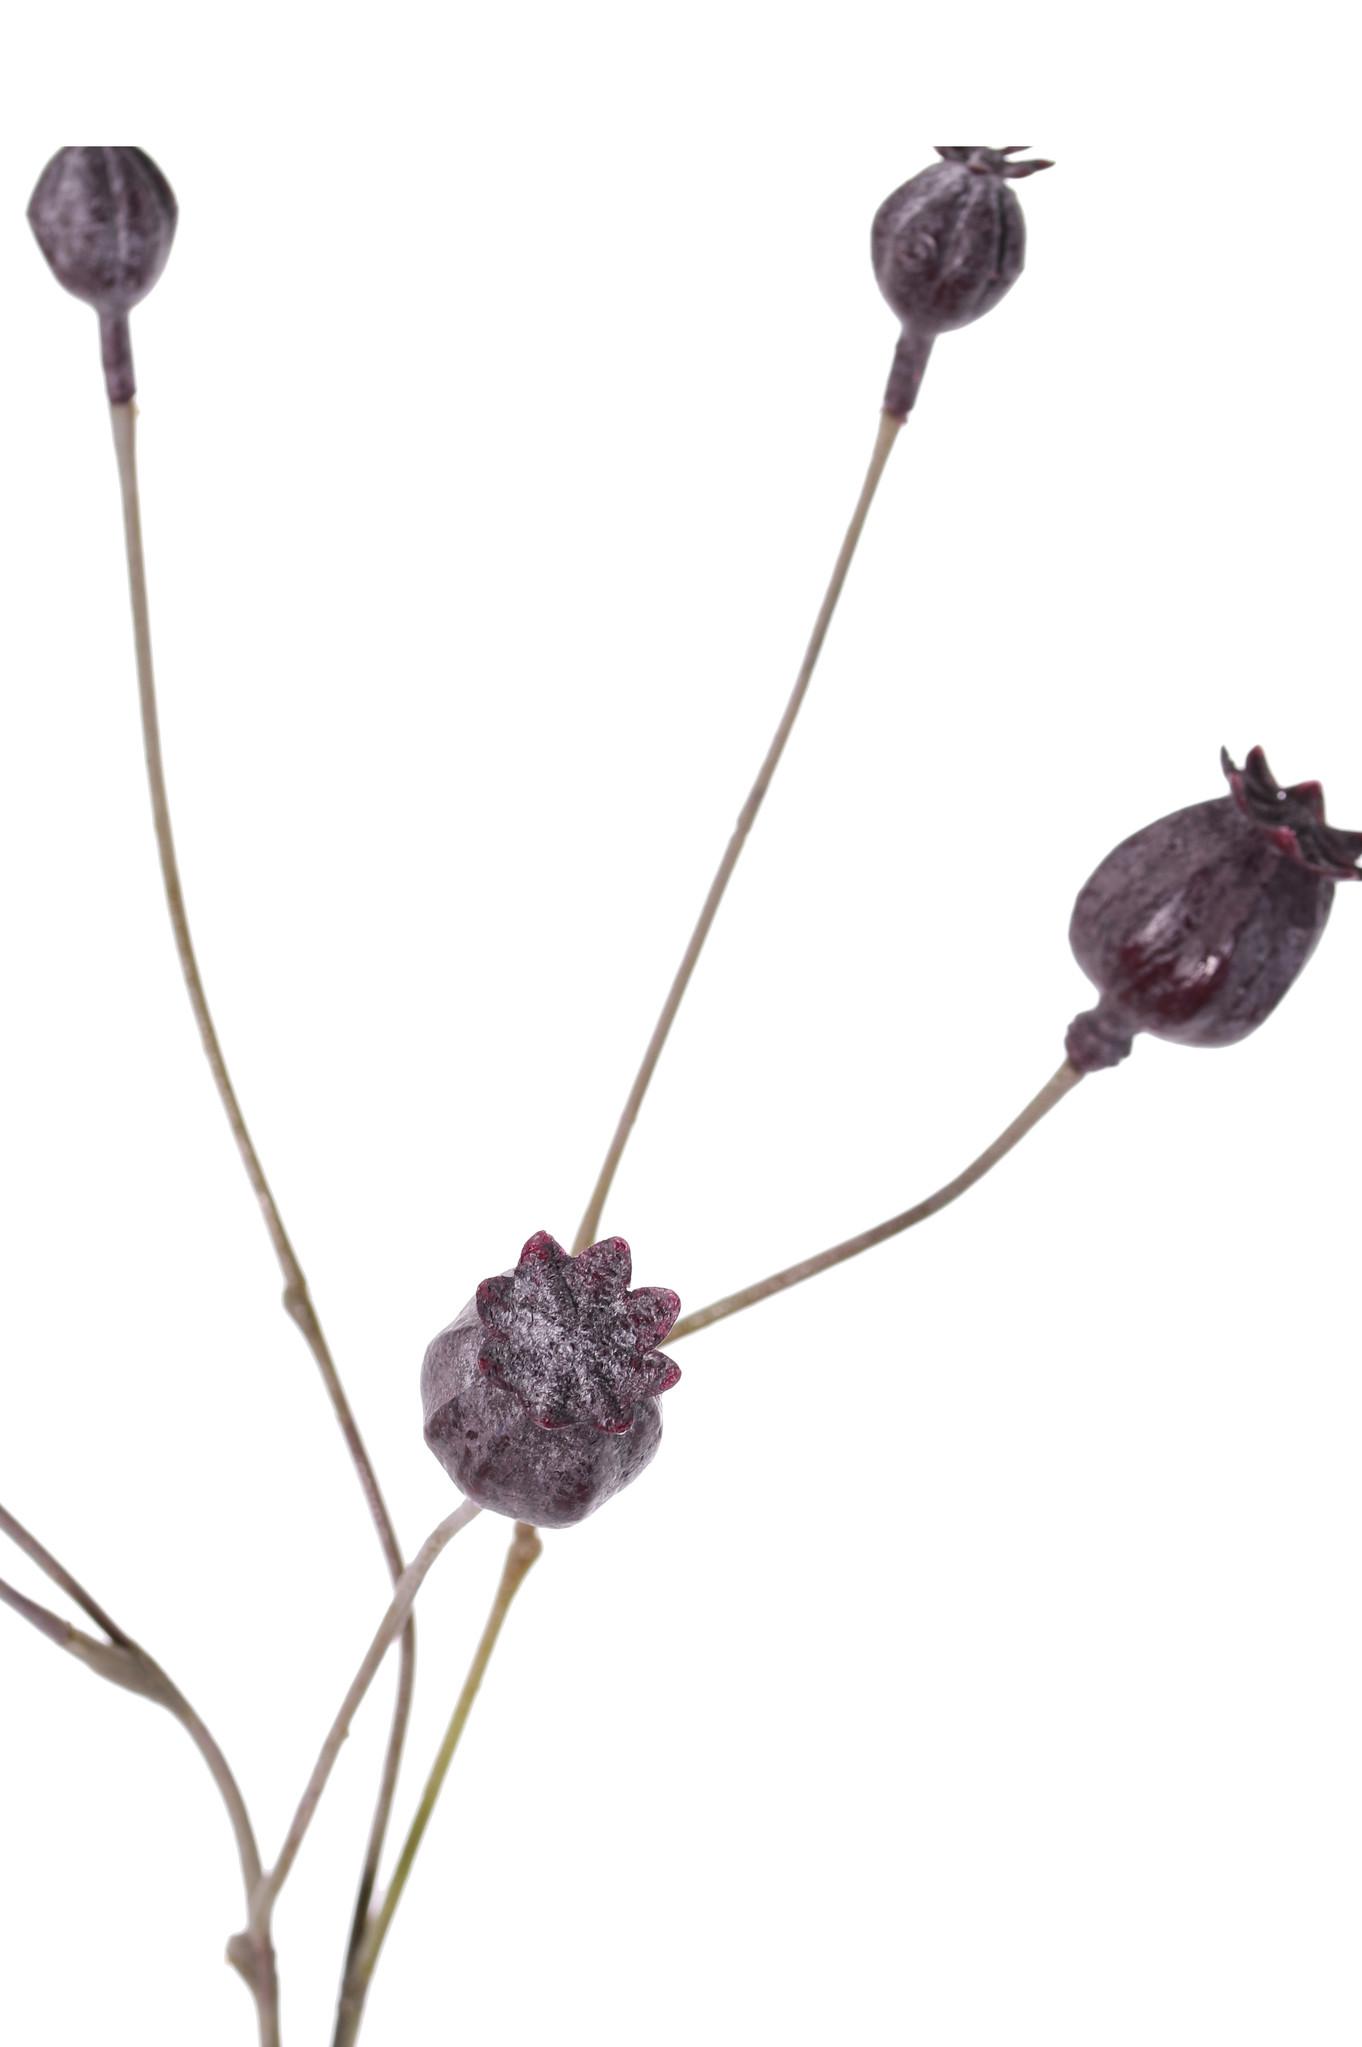 Mohnblumen, Kapselfruchtzweig, 6 Kapseln, Vollplastik, 68cm